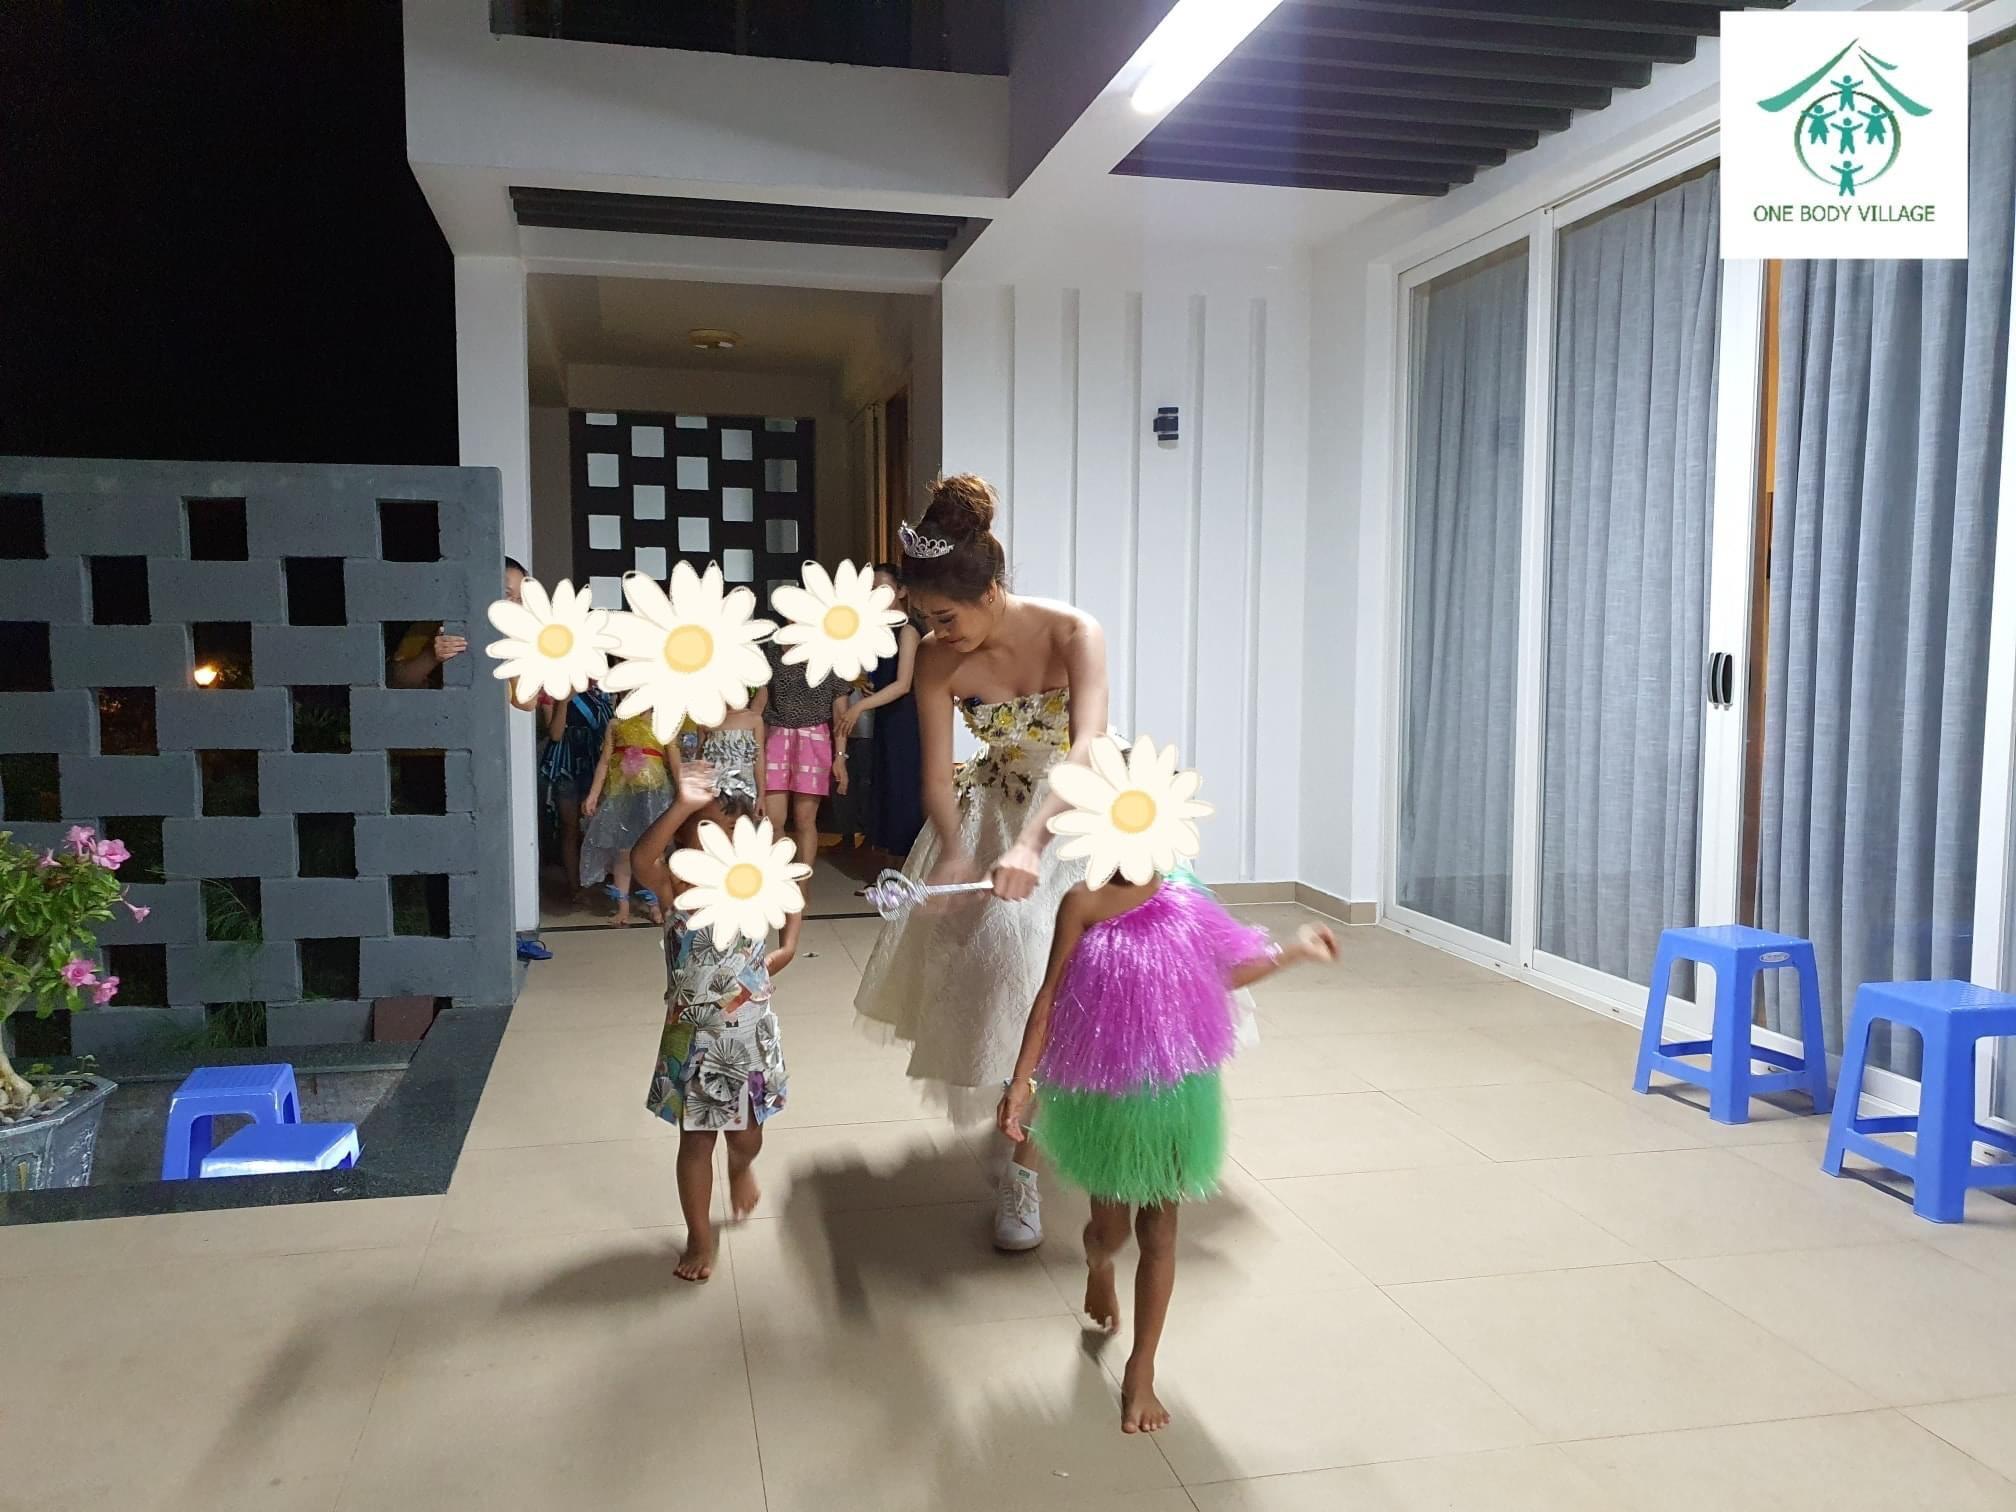 Hoa hau Khanh Van_OBV1